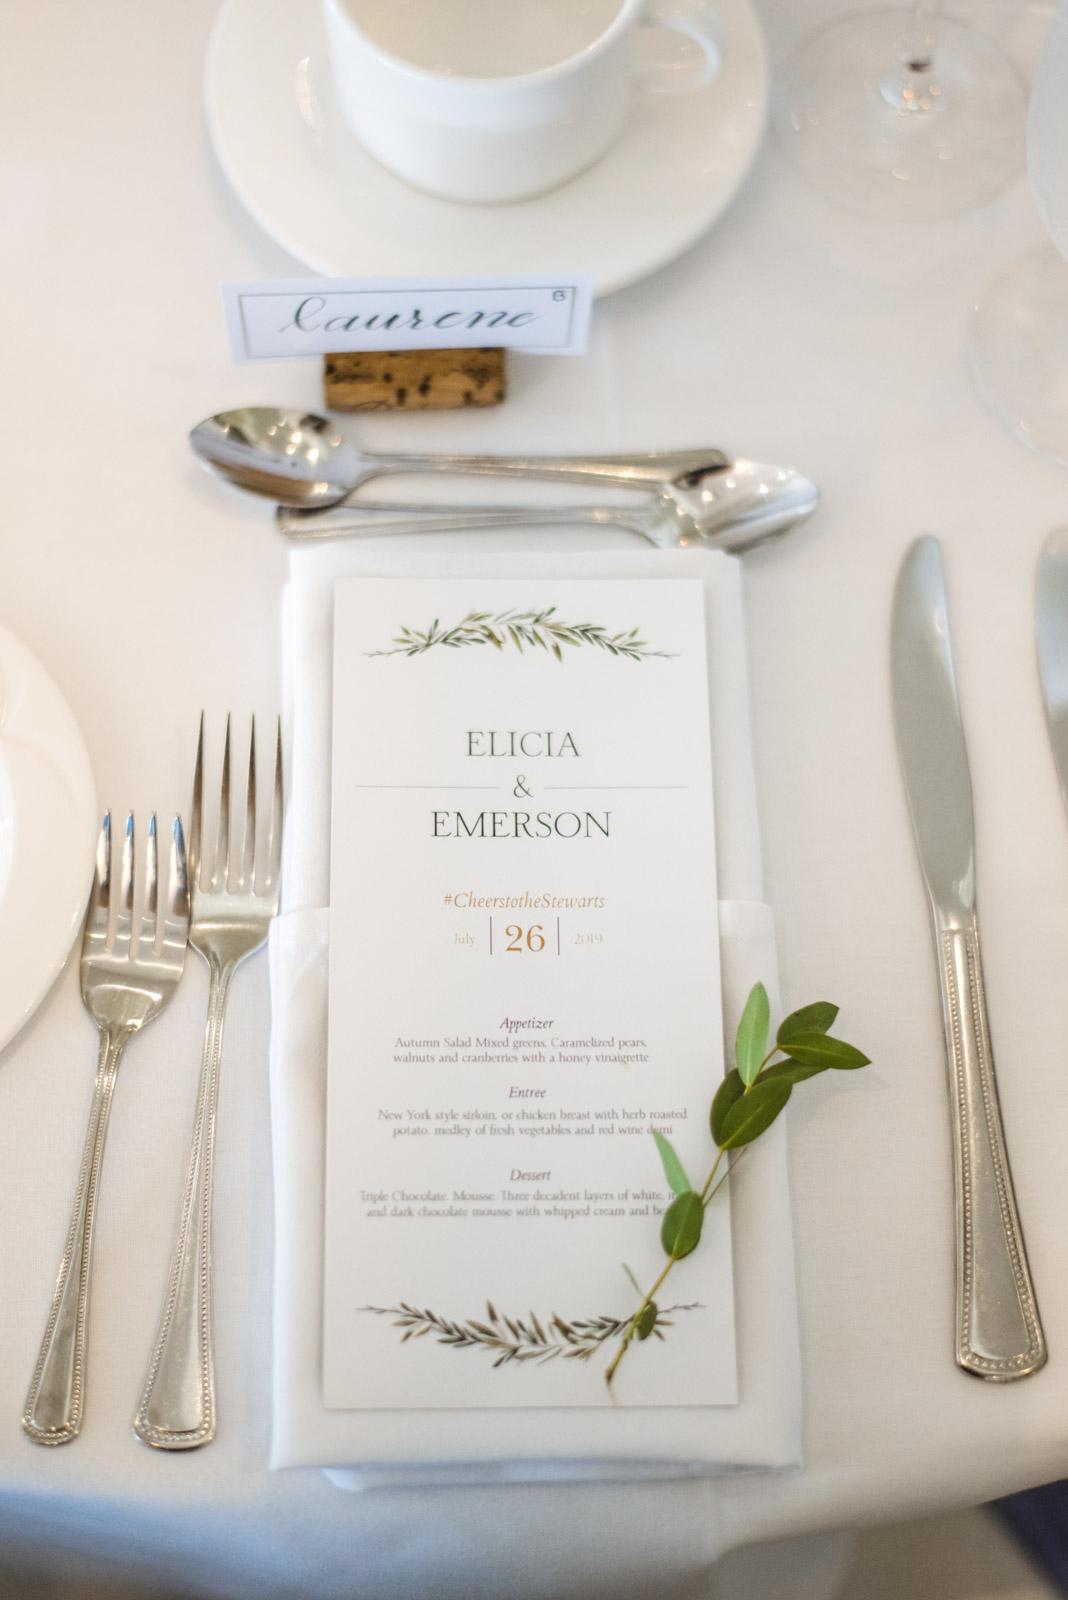 Emerson & Elicia's Golf Course Wedding Aidan & Leanne Hennebry Hamilton Wedding Videographers Photographers Niagara Hush Hush Photography & Film-56.jpg